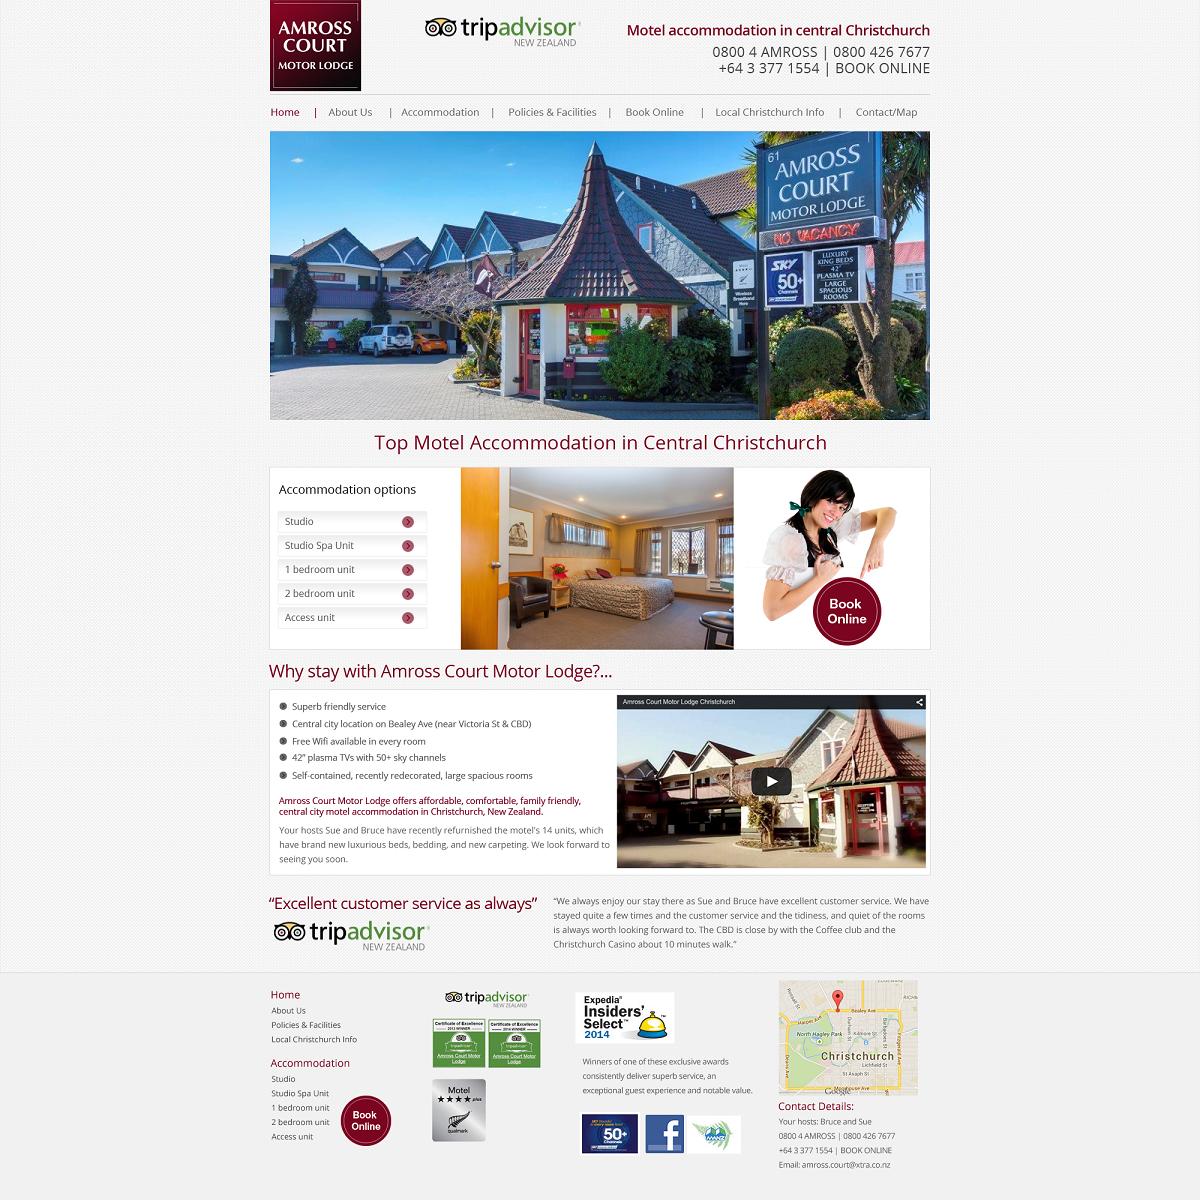 Web Design For Web Genius By Lv2 Design 5160425